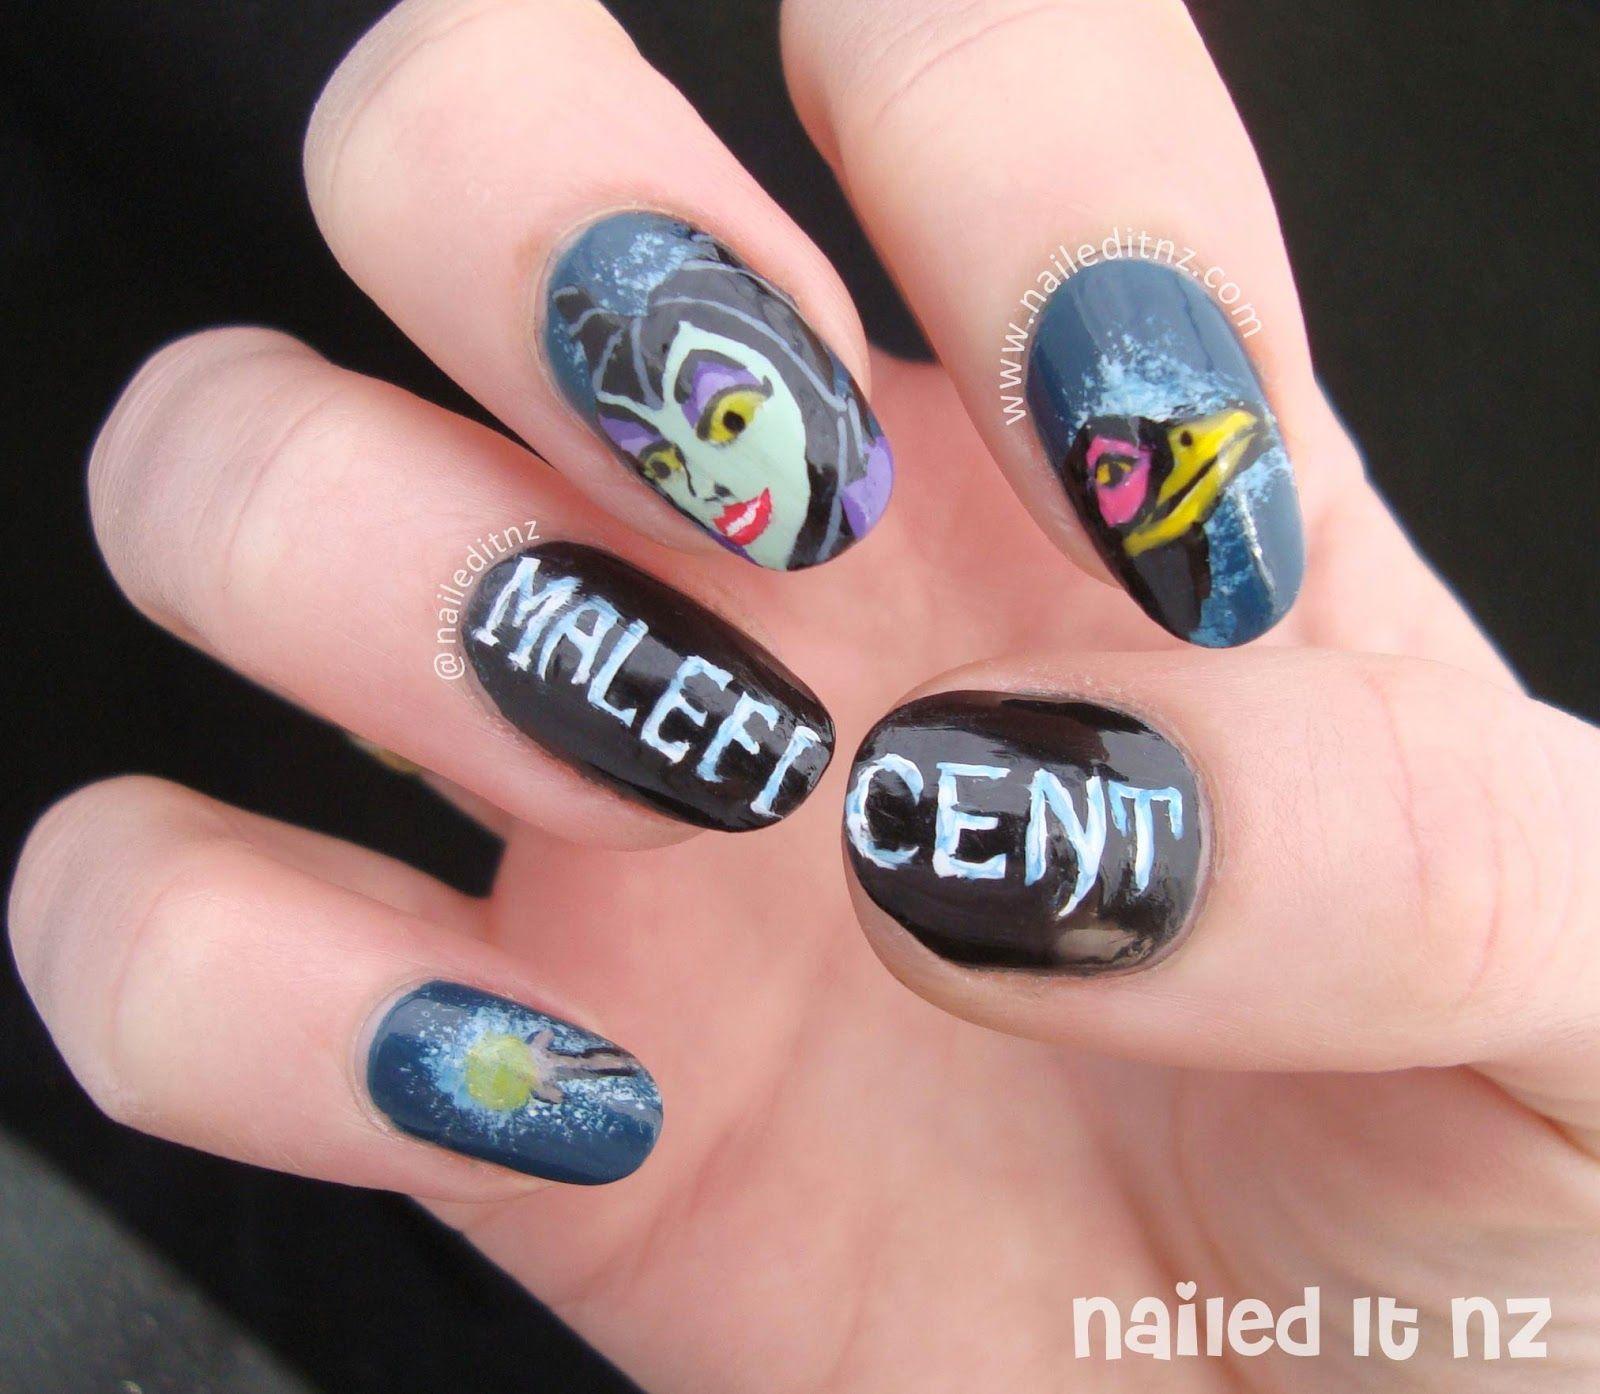 Nailed It Nz Disney Nail Art 7 Sleeping Beauty Maleficent